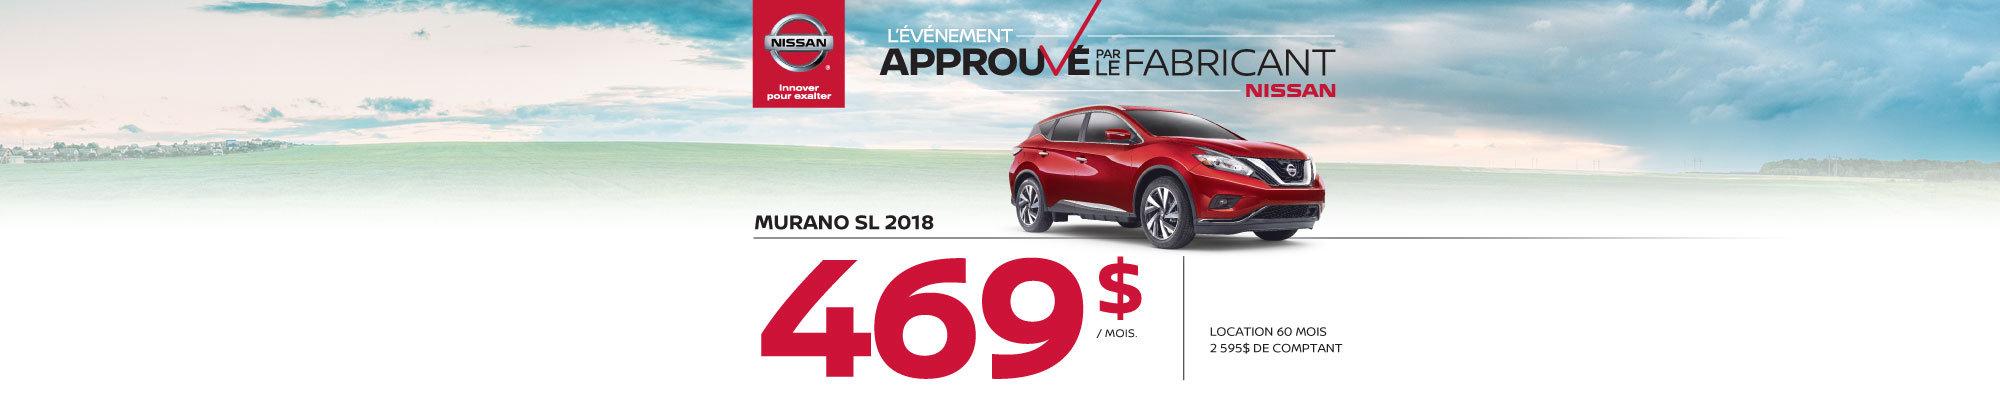 Nissan Murano 2018 web